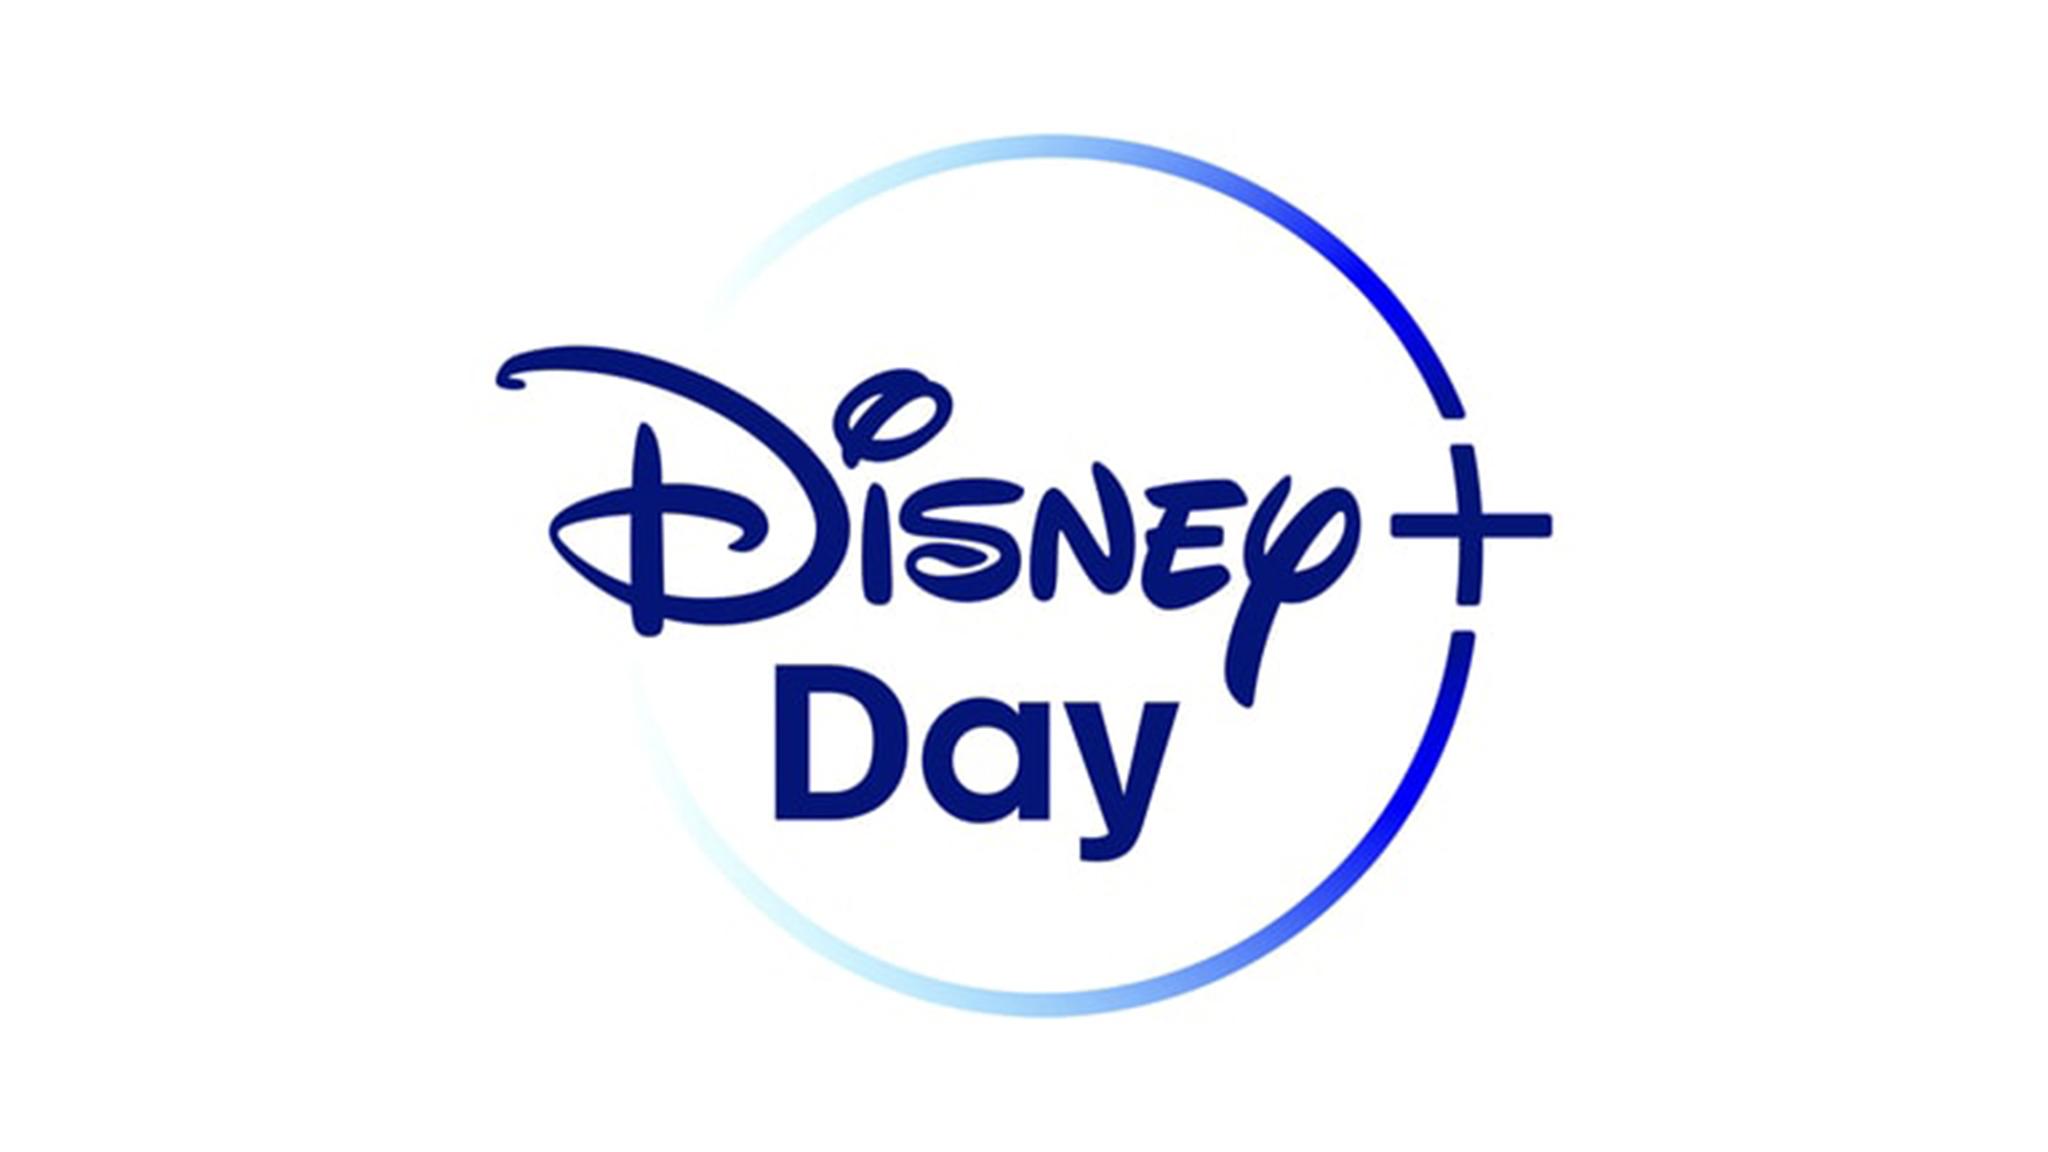 AM 12. NOVEMBER IST DISNEY+ DAY